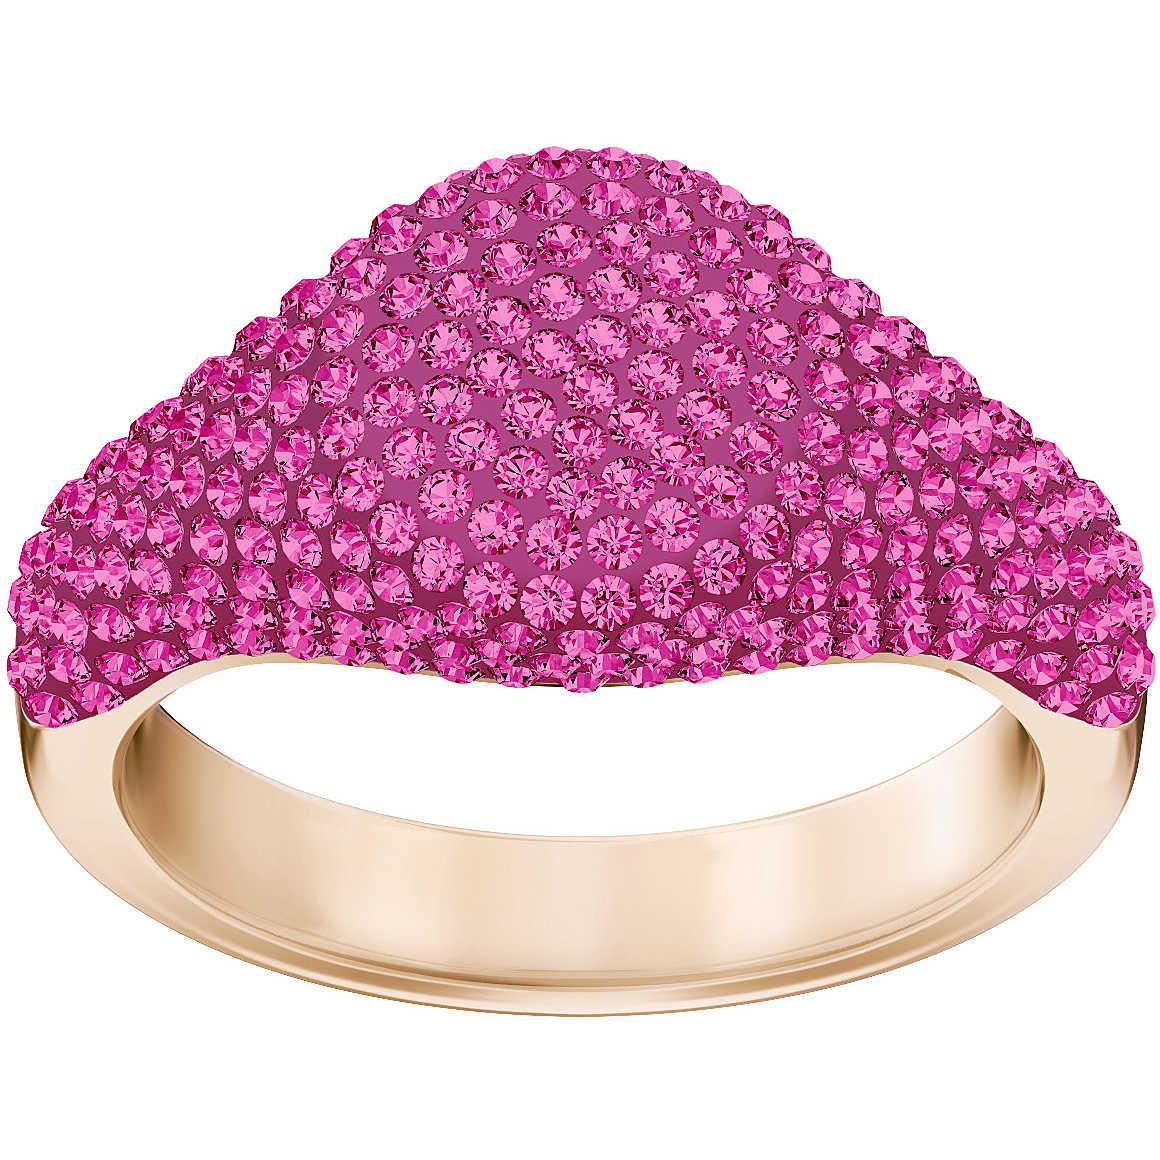 ring woman jewellery Swarovski Stone Signet 5413611 rings Swarovski